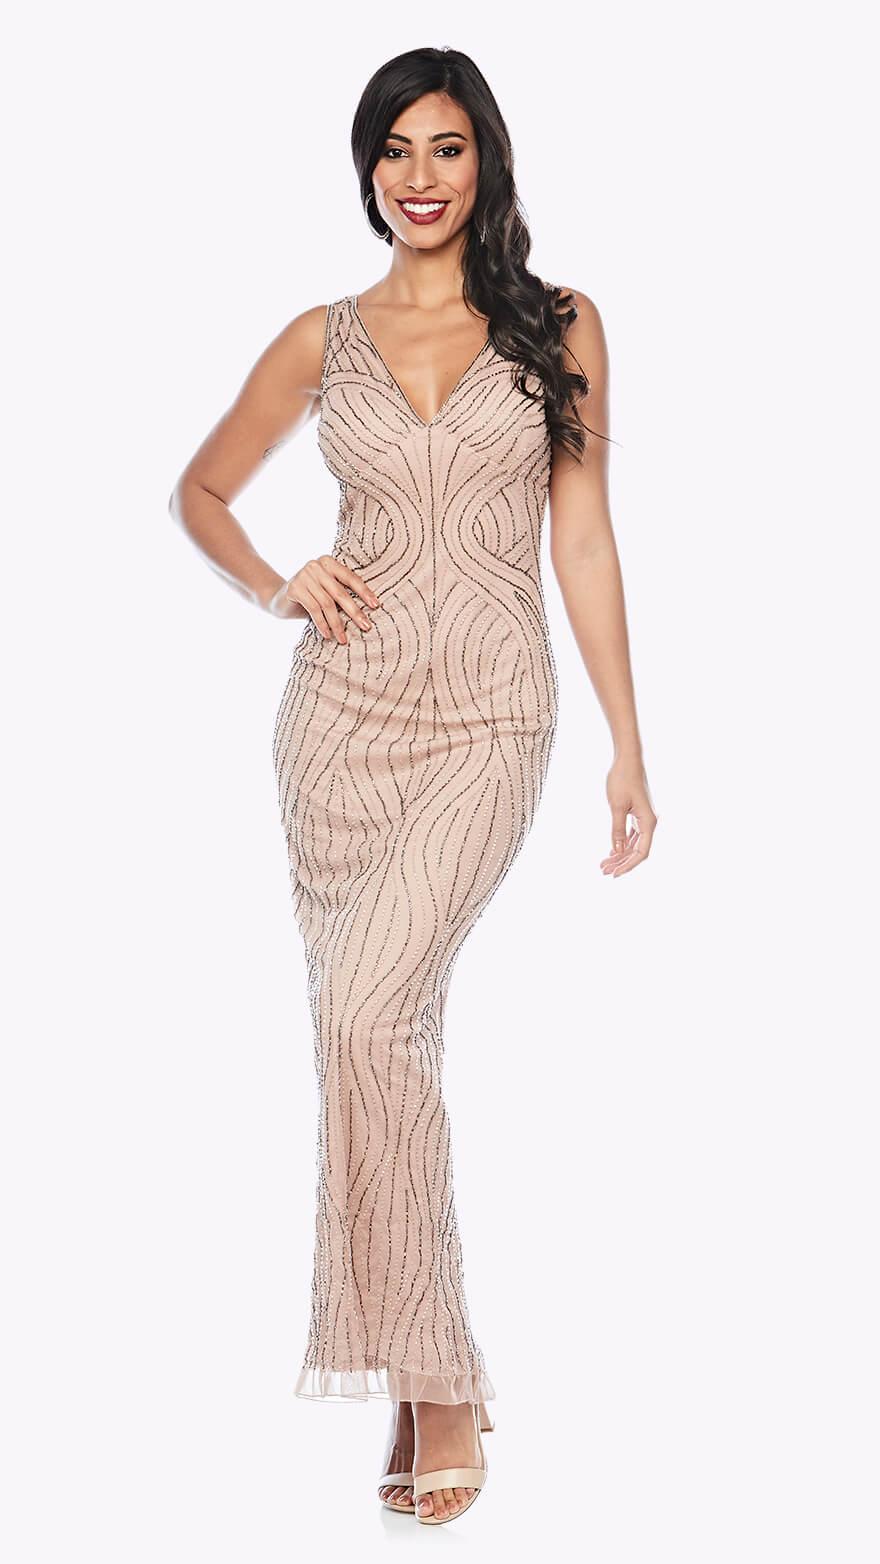 Z0228 Full-length beaded gown in organic pattern with V neckline